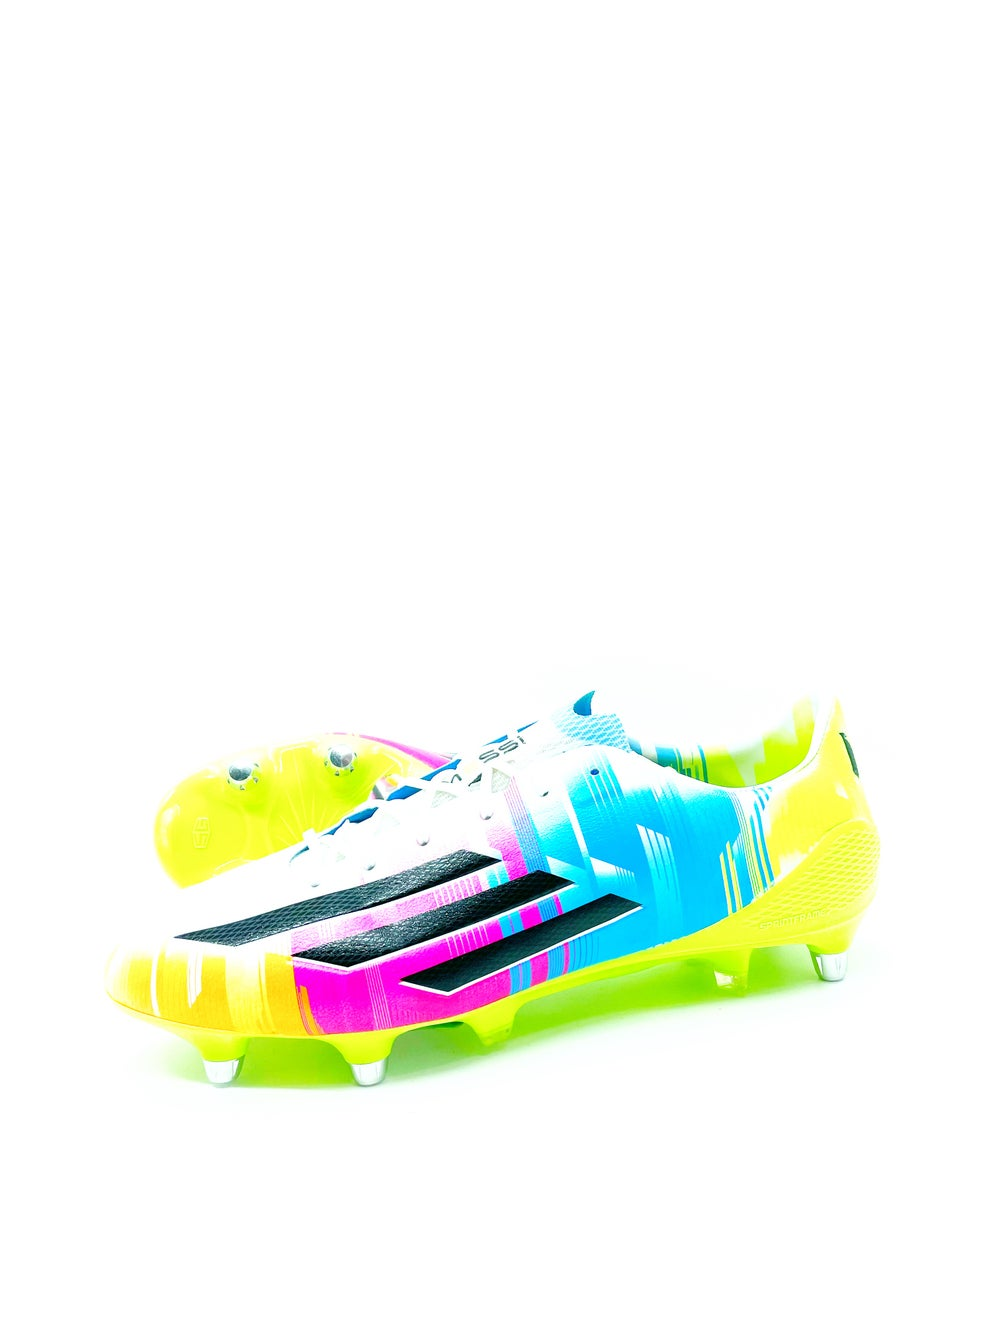 Image of Adidas F50 Messi SG